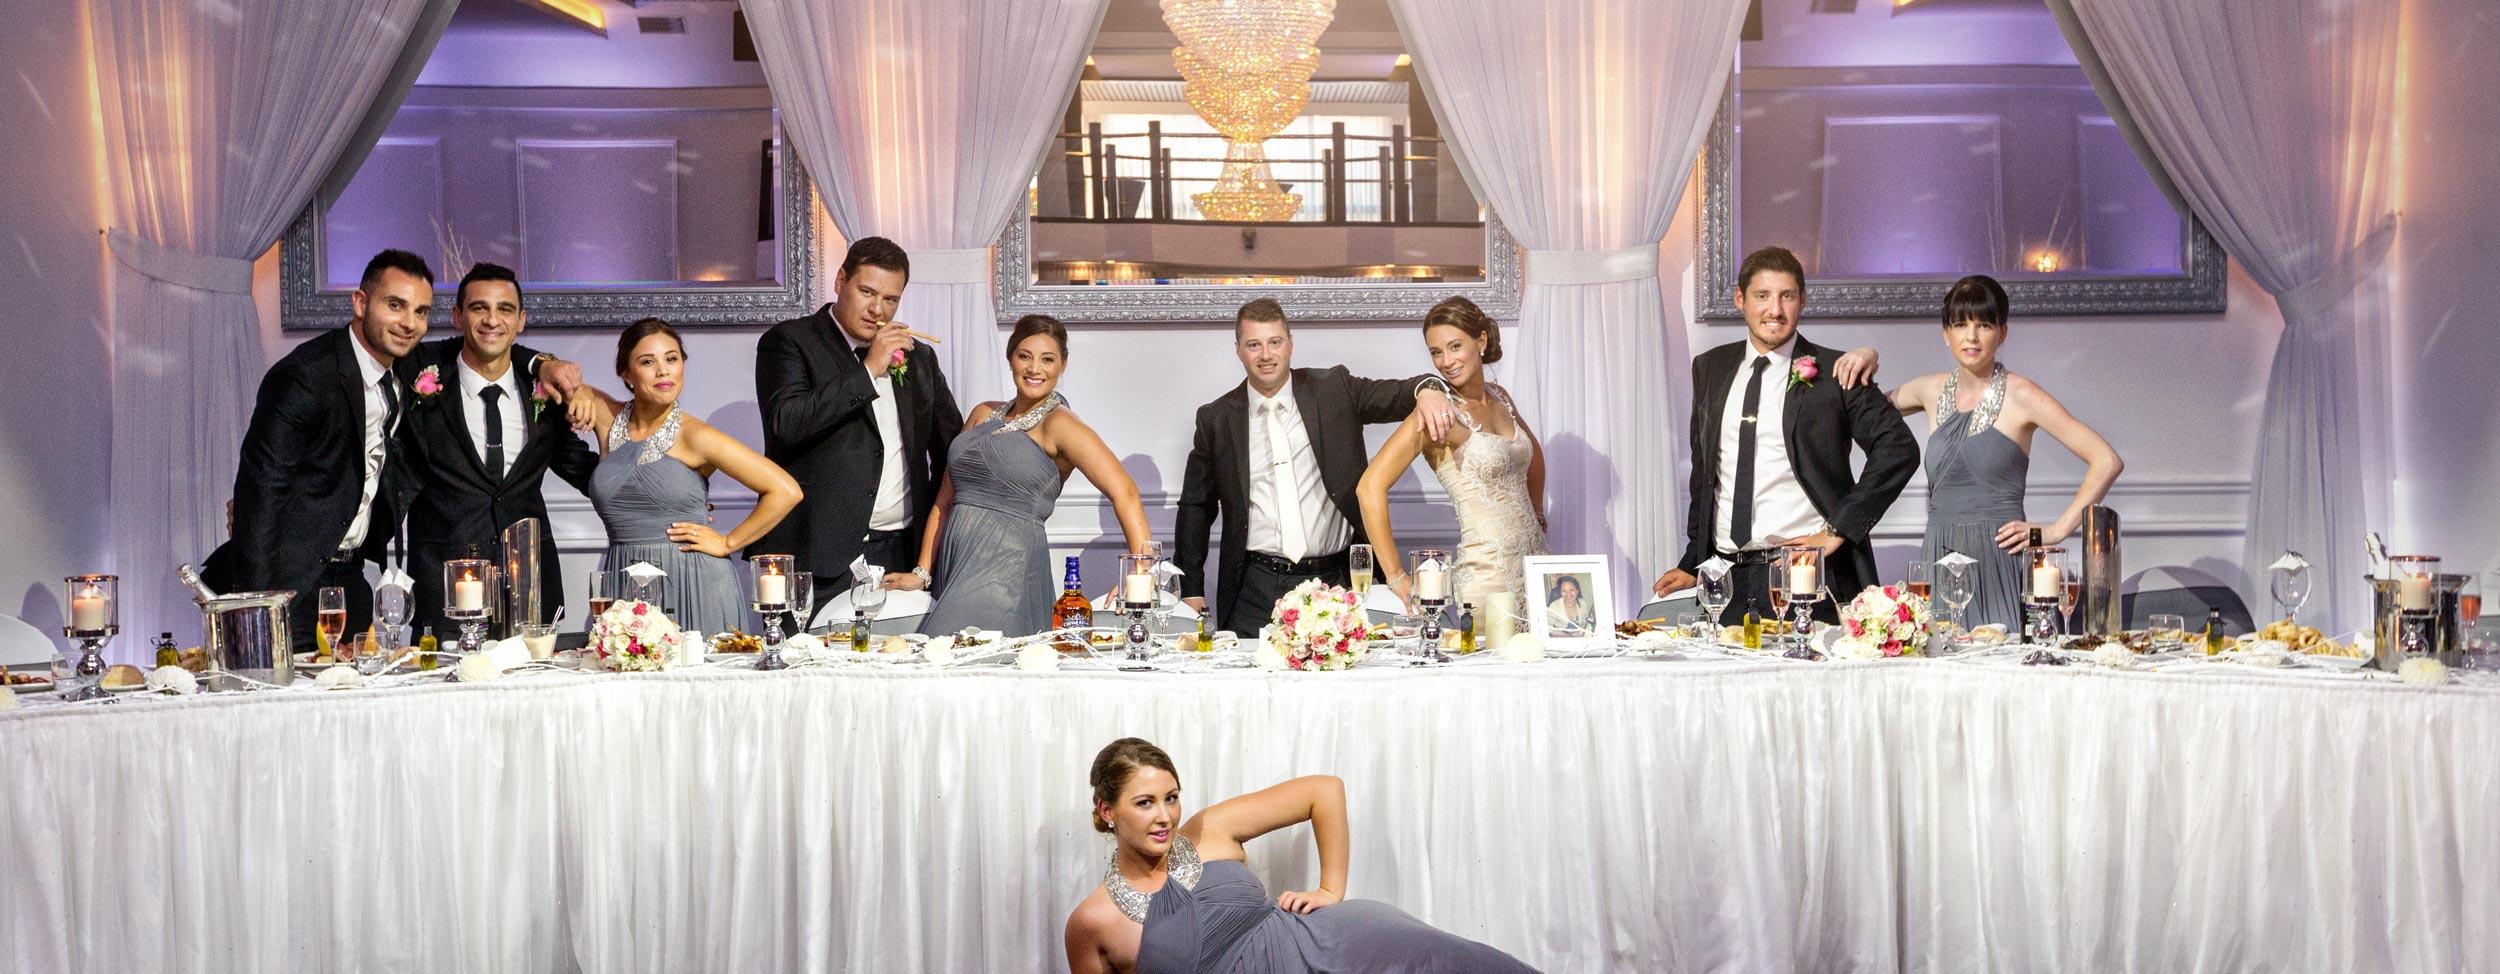 John Di Fede wedding masterpiece photo